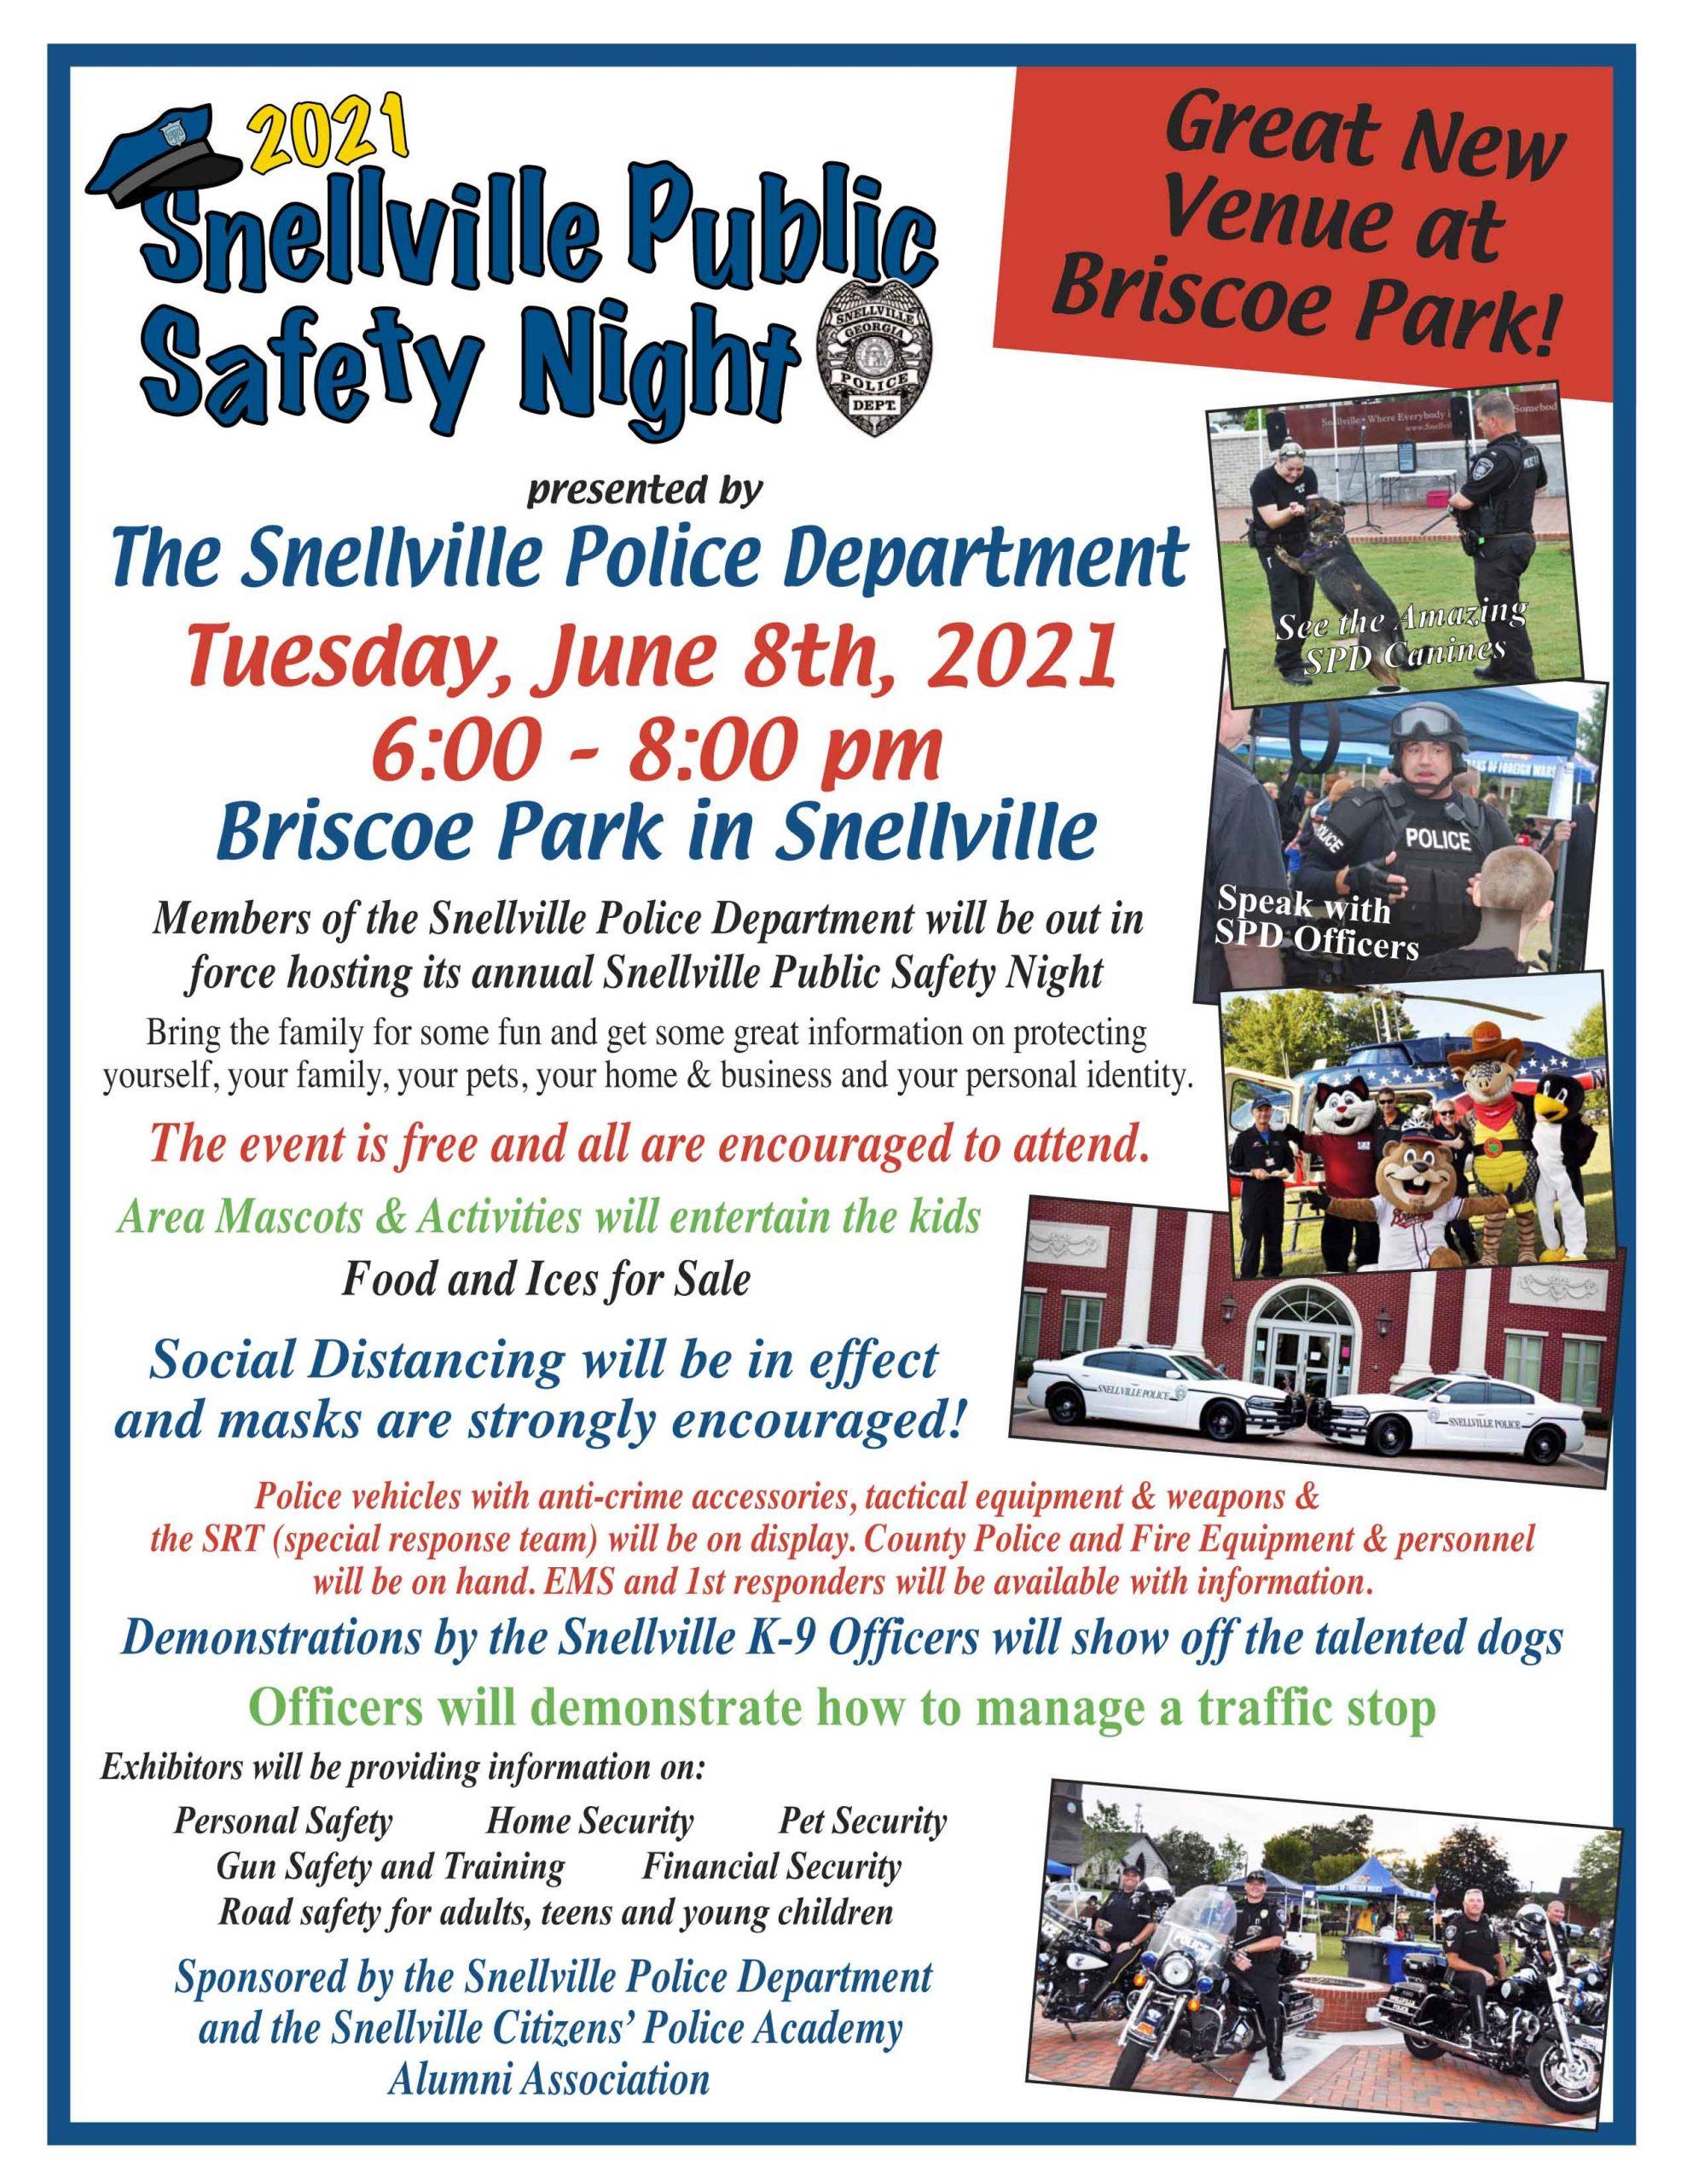 Snellville Public Safety Night